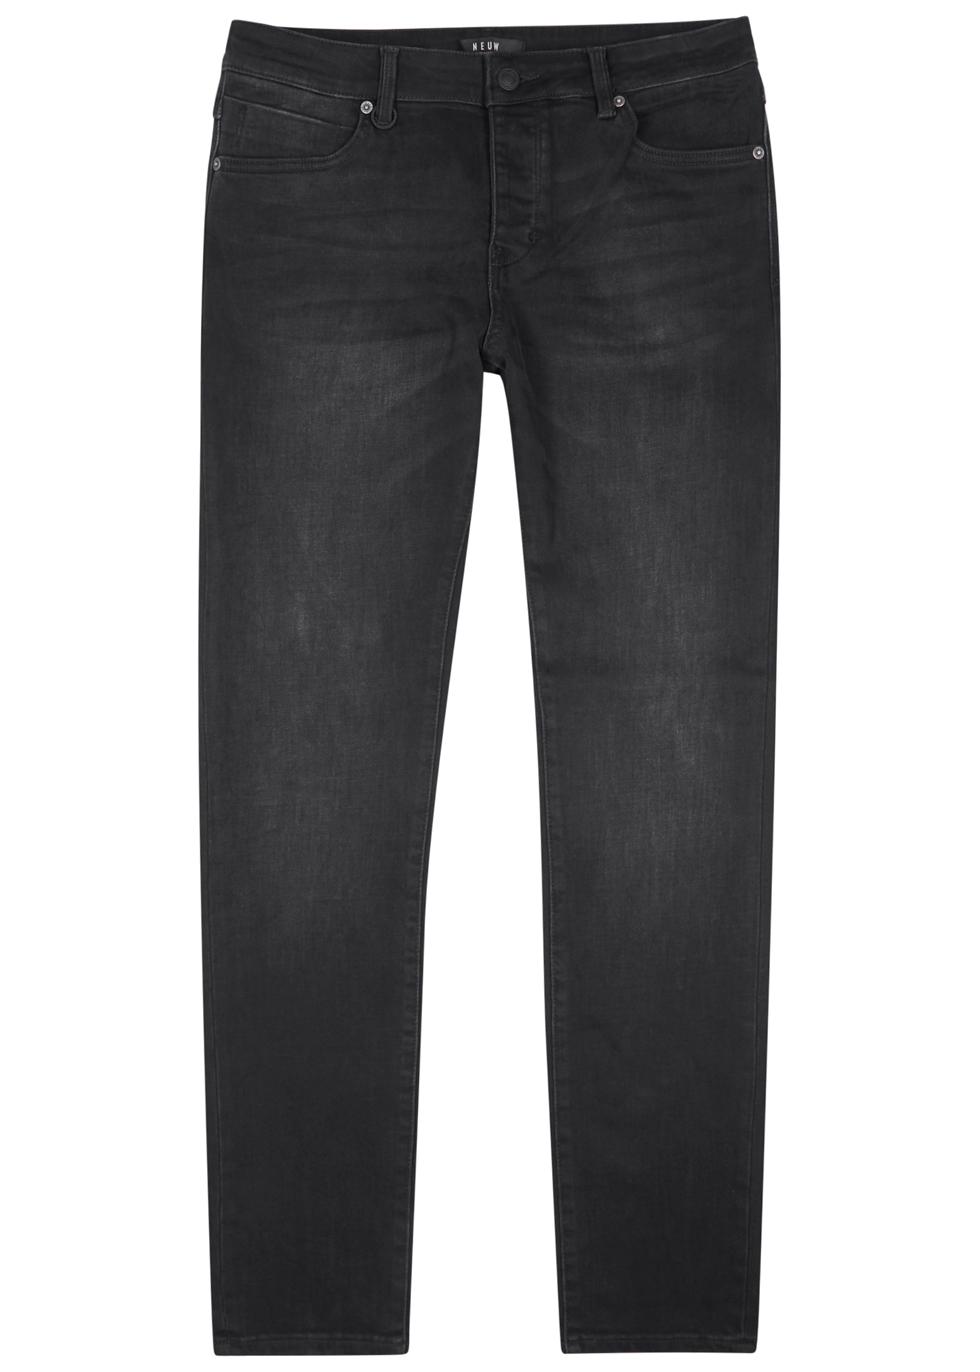 Iggy black skinny jeans